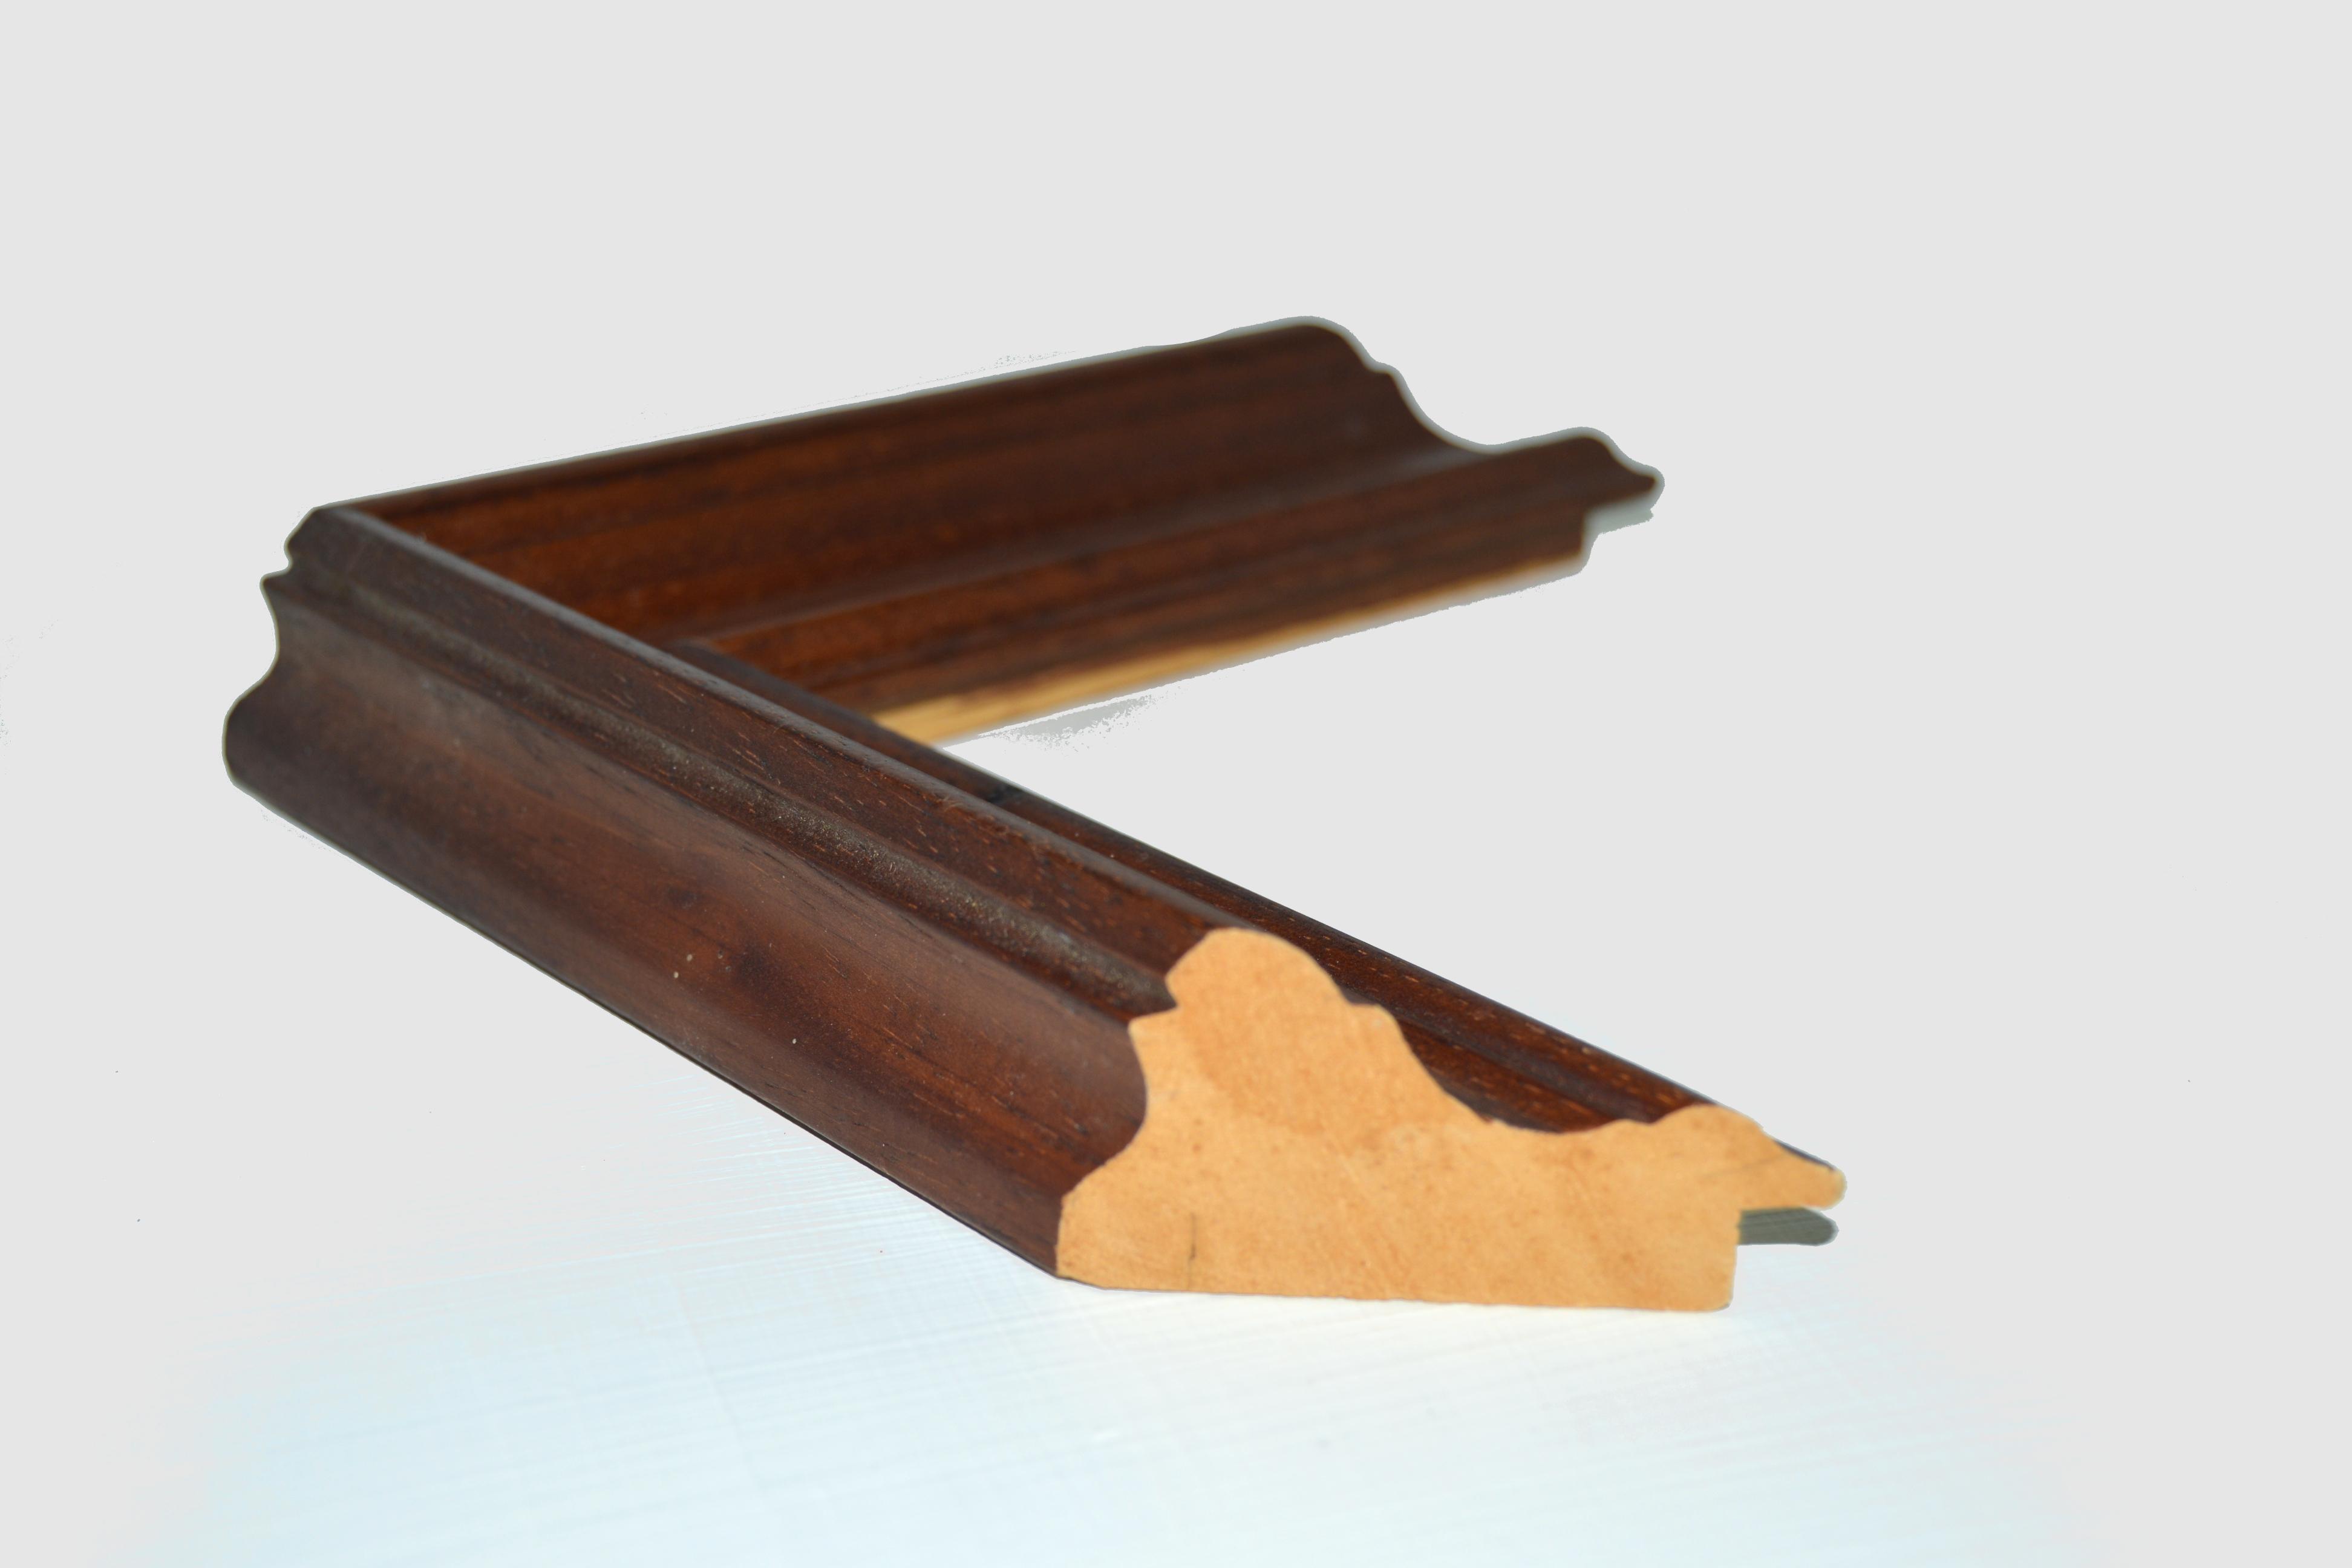 00034-503-ancho4,8cm-perfil